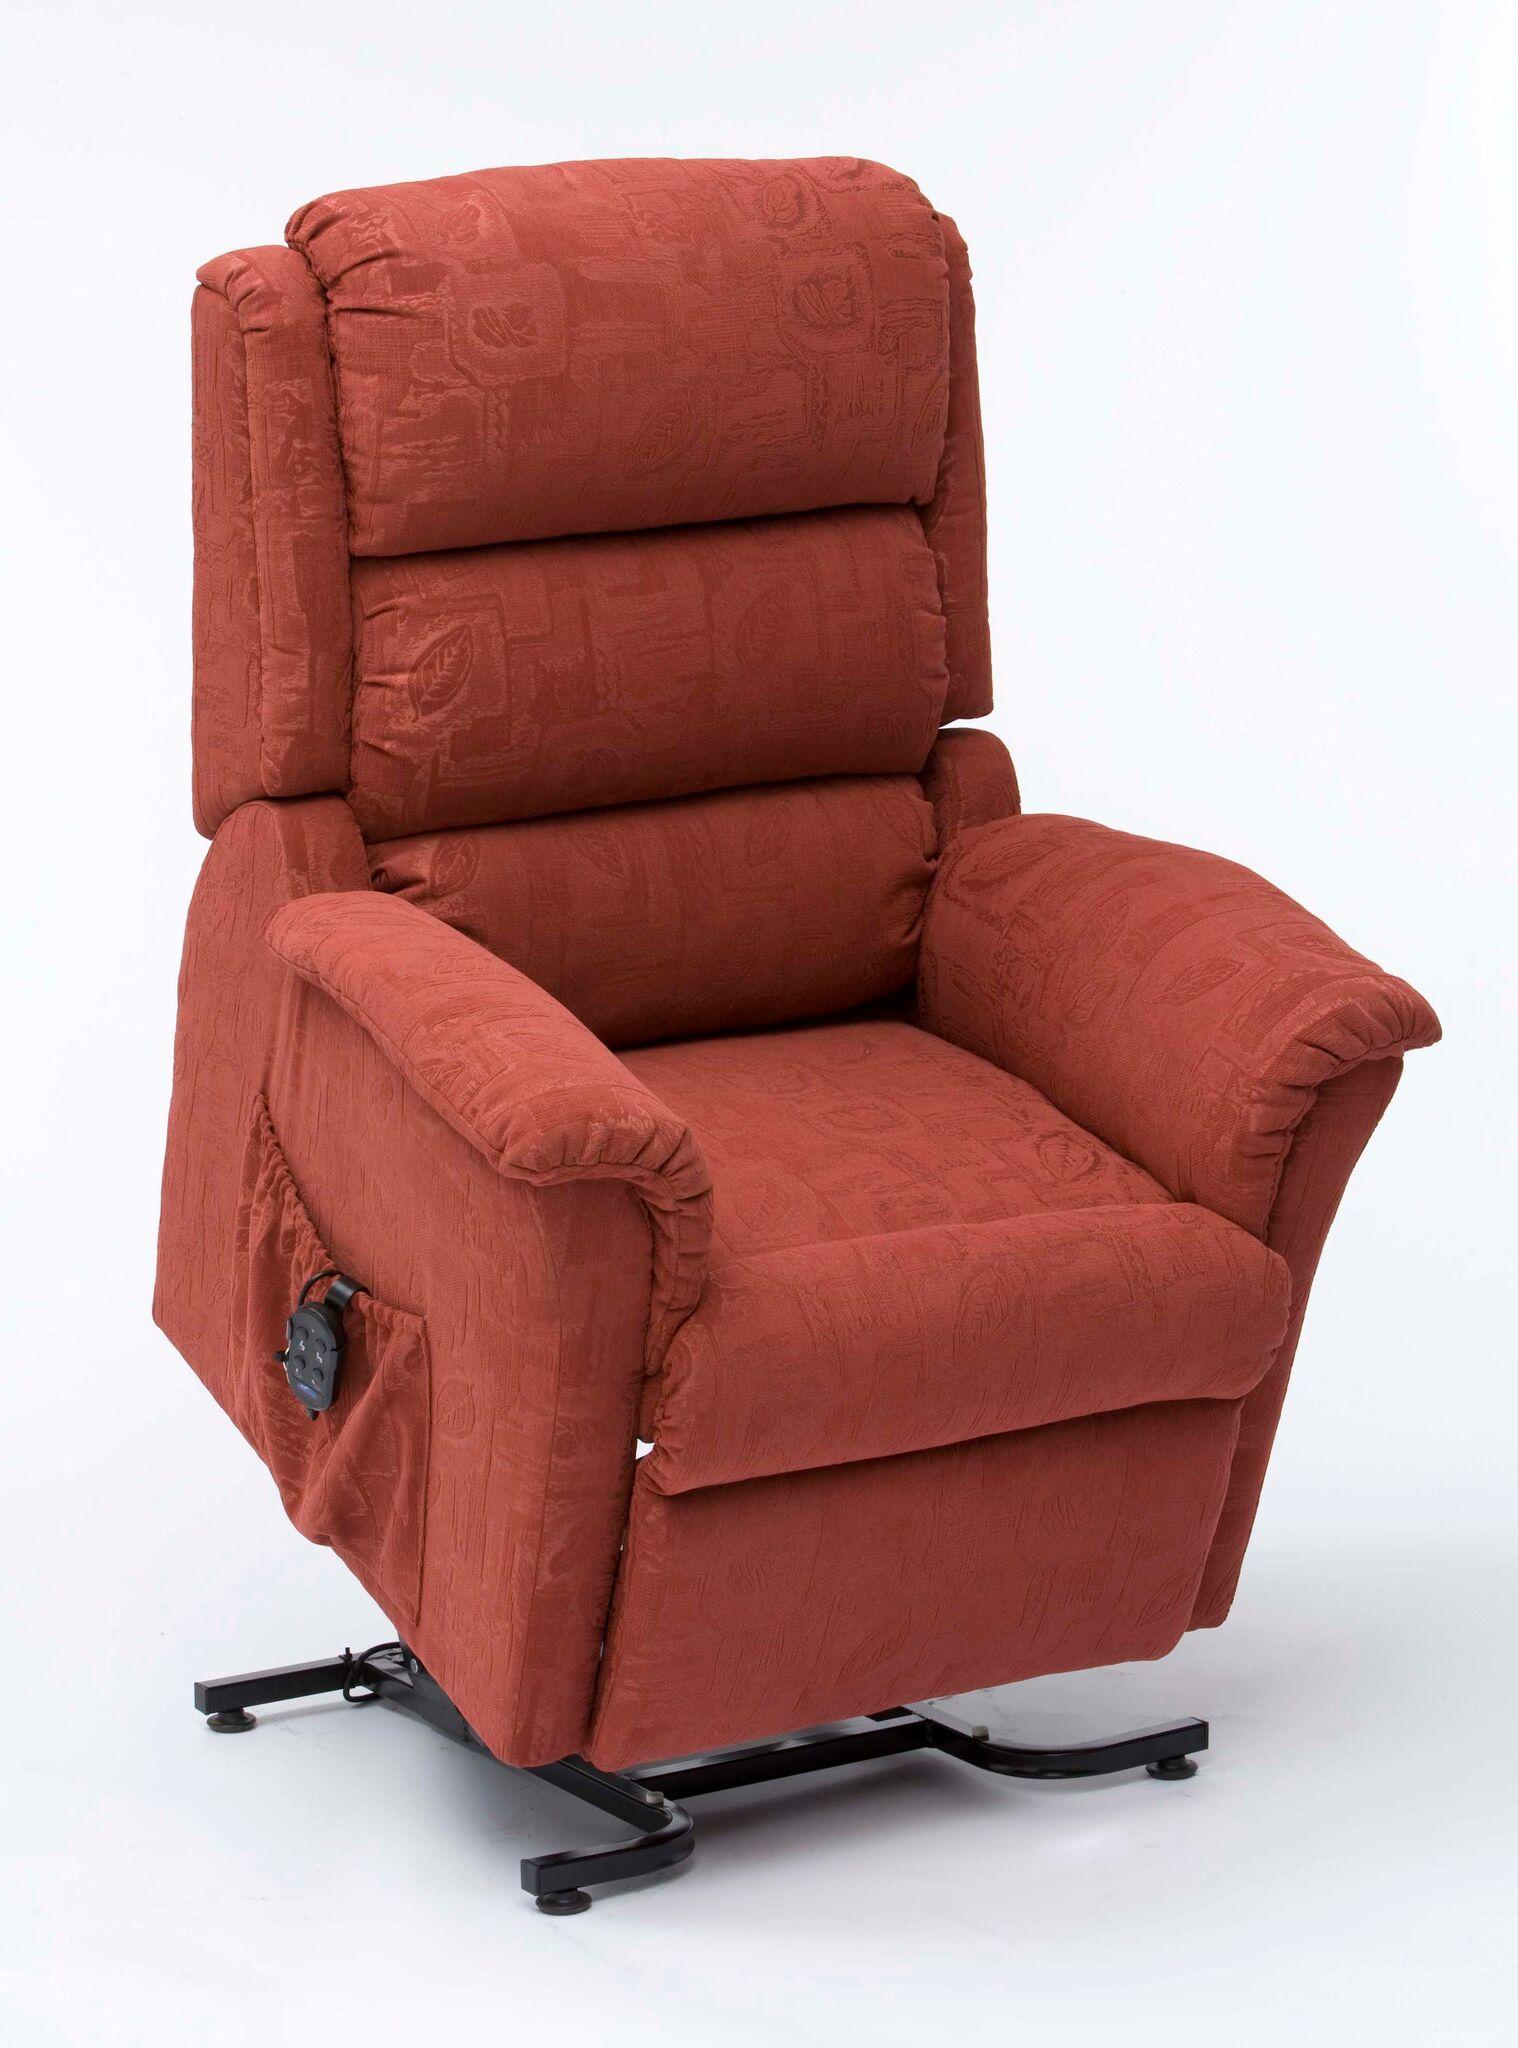 Find petite recliner — pic 7